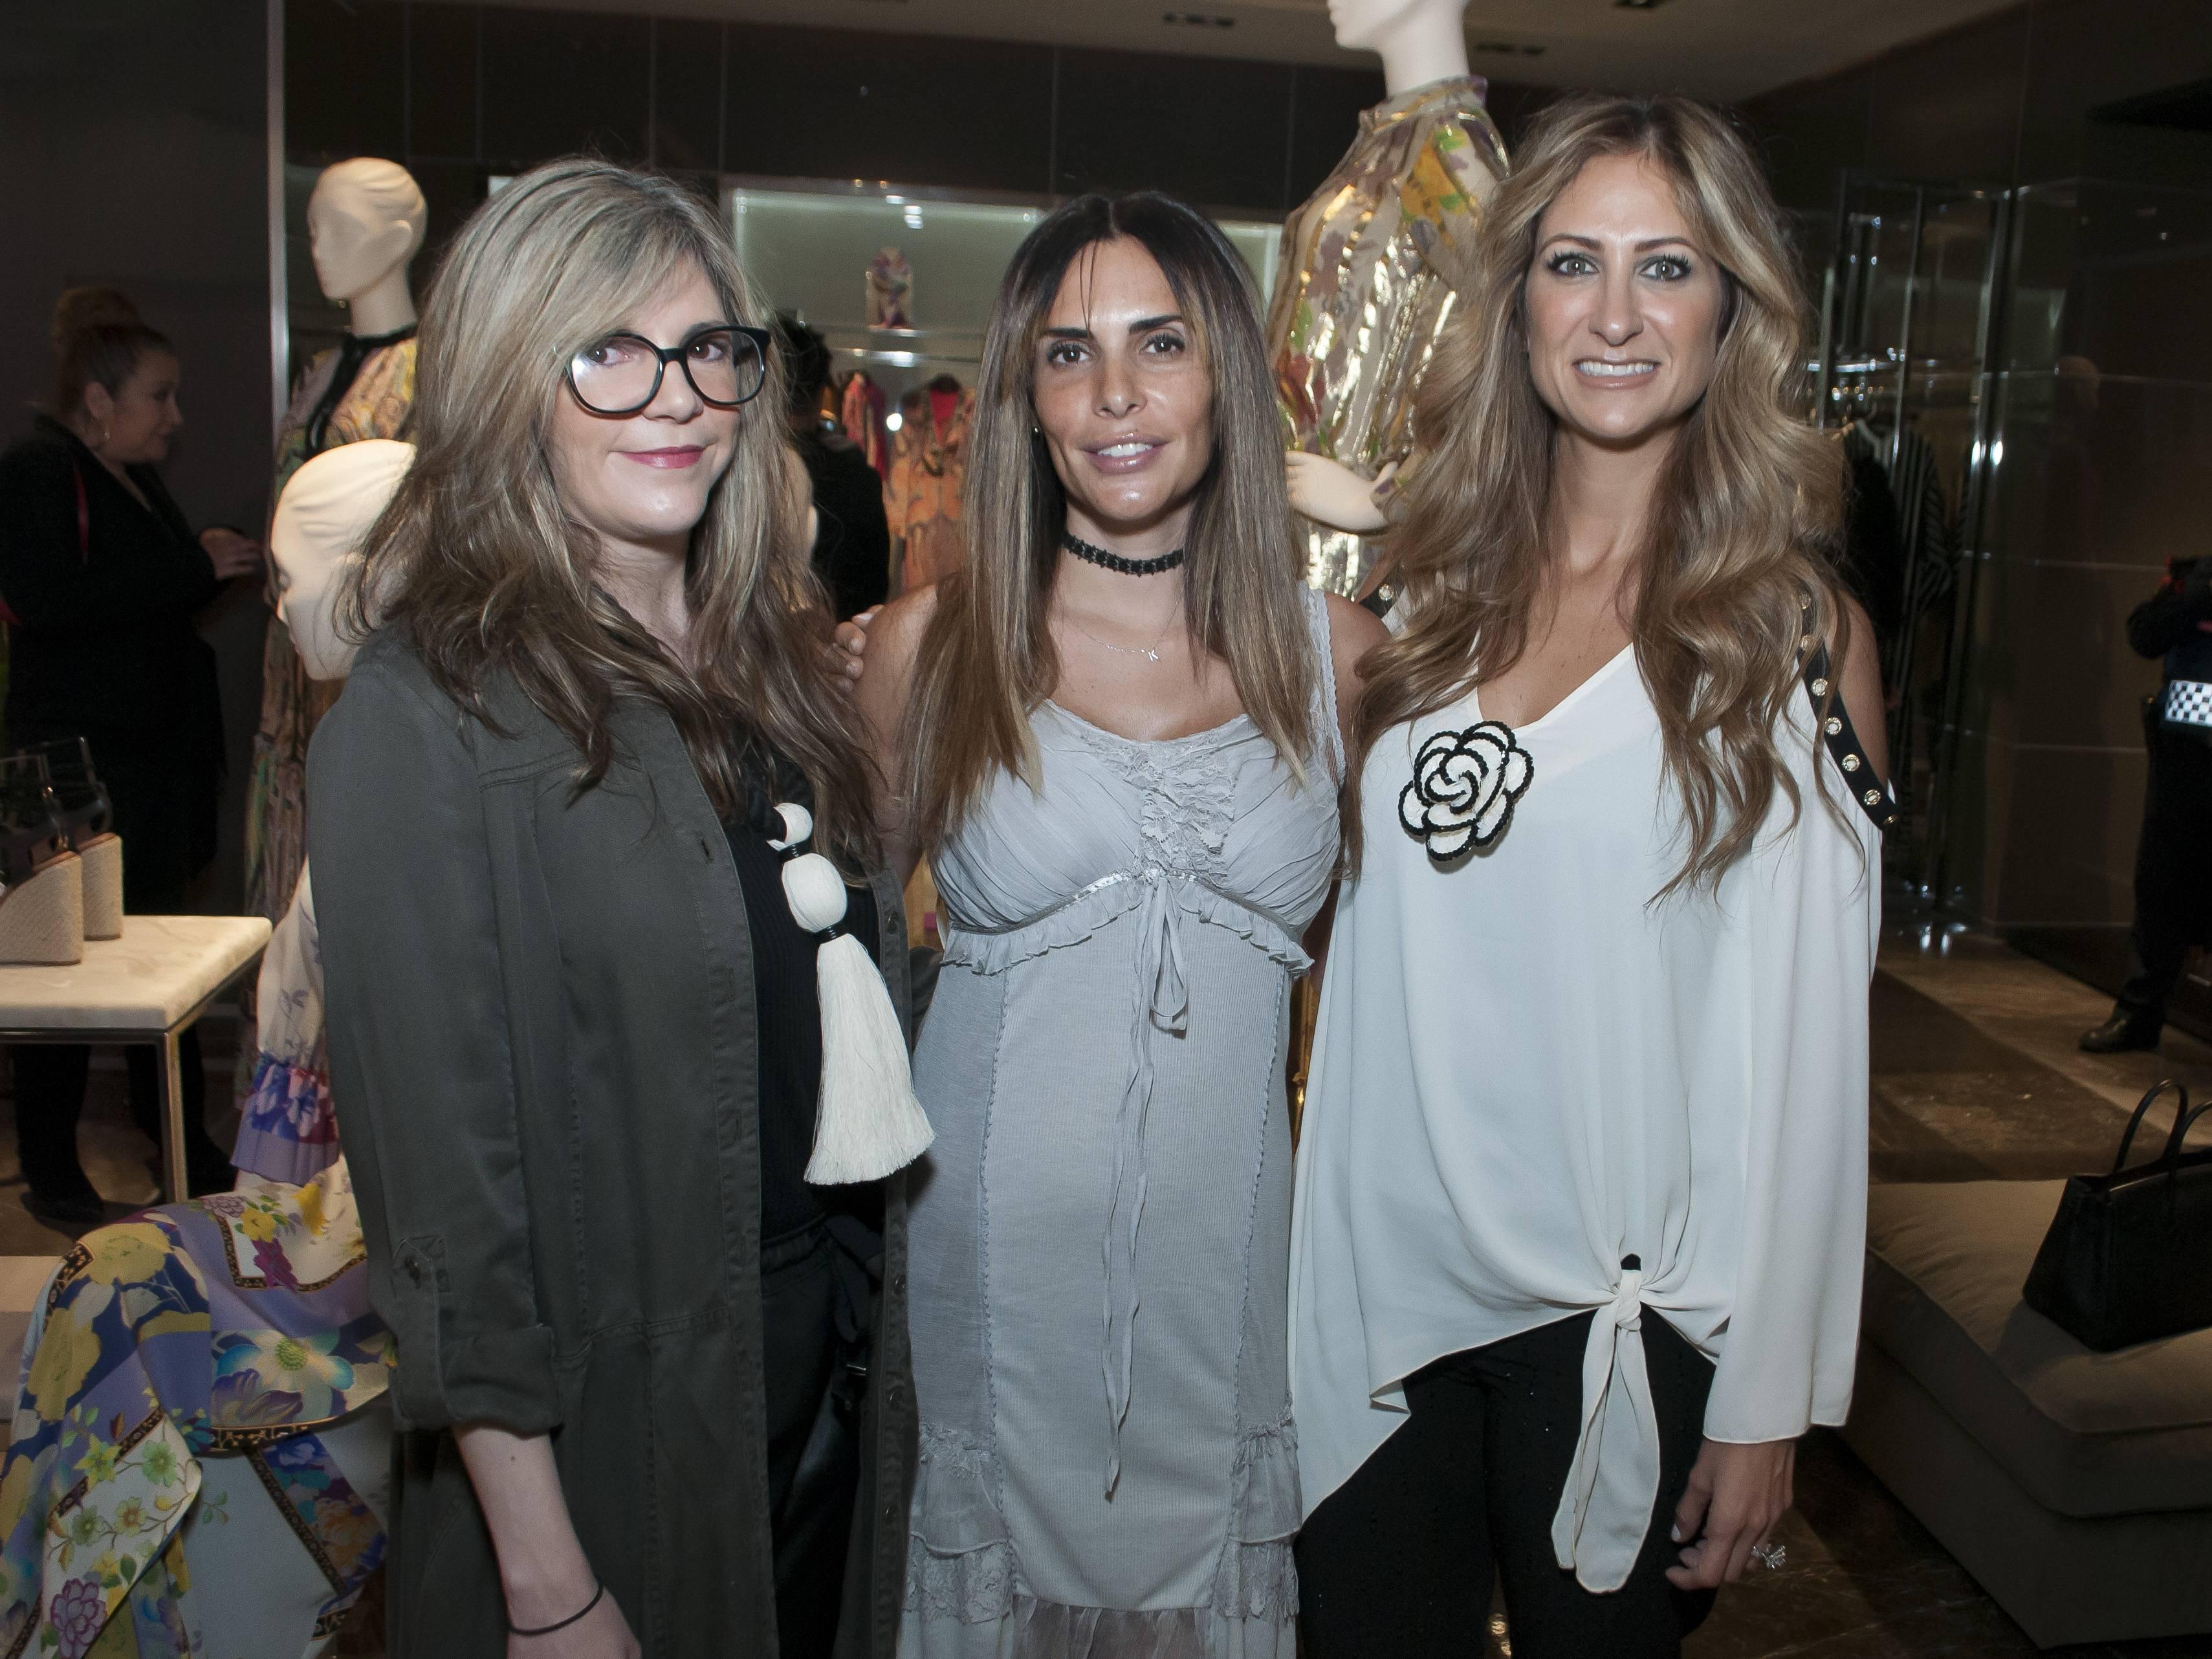 Mariana Rivera, Karla Arelle y Pixie Devlyn JDS